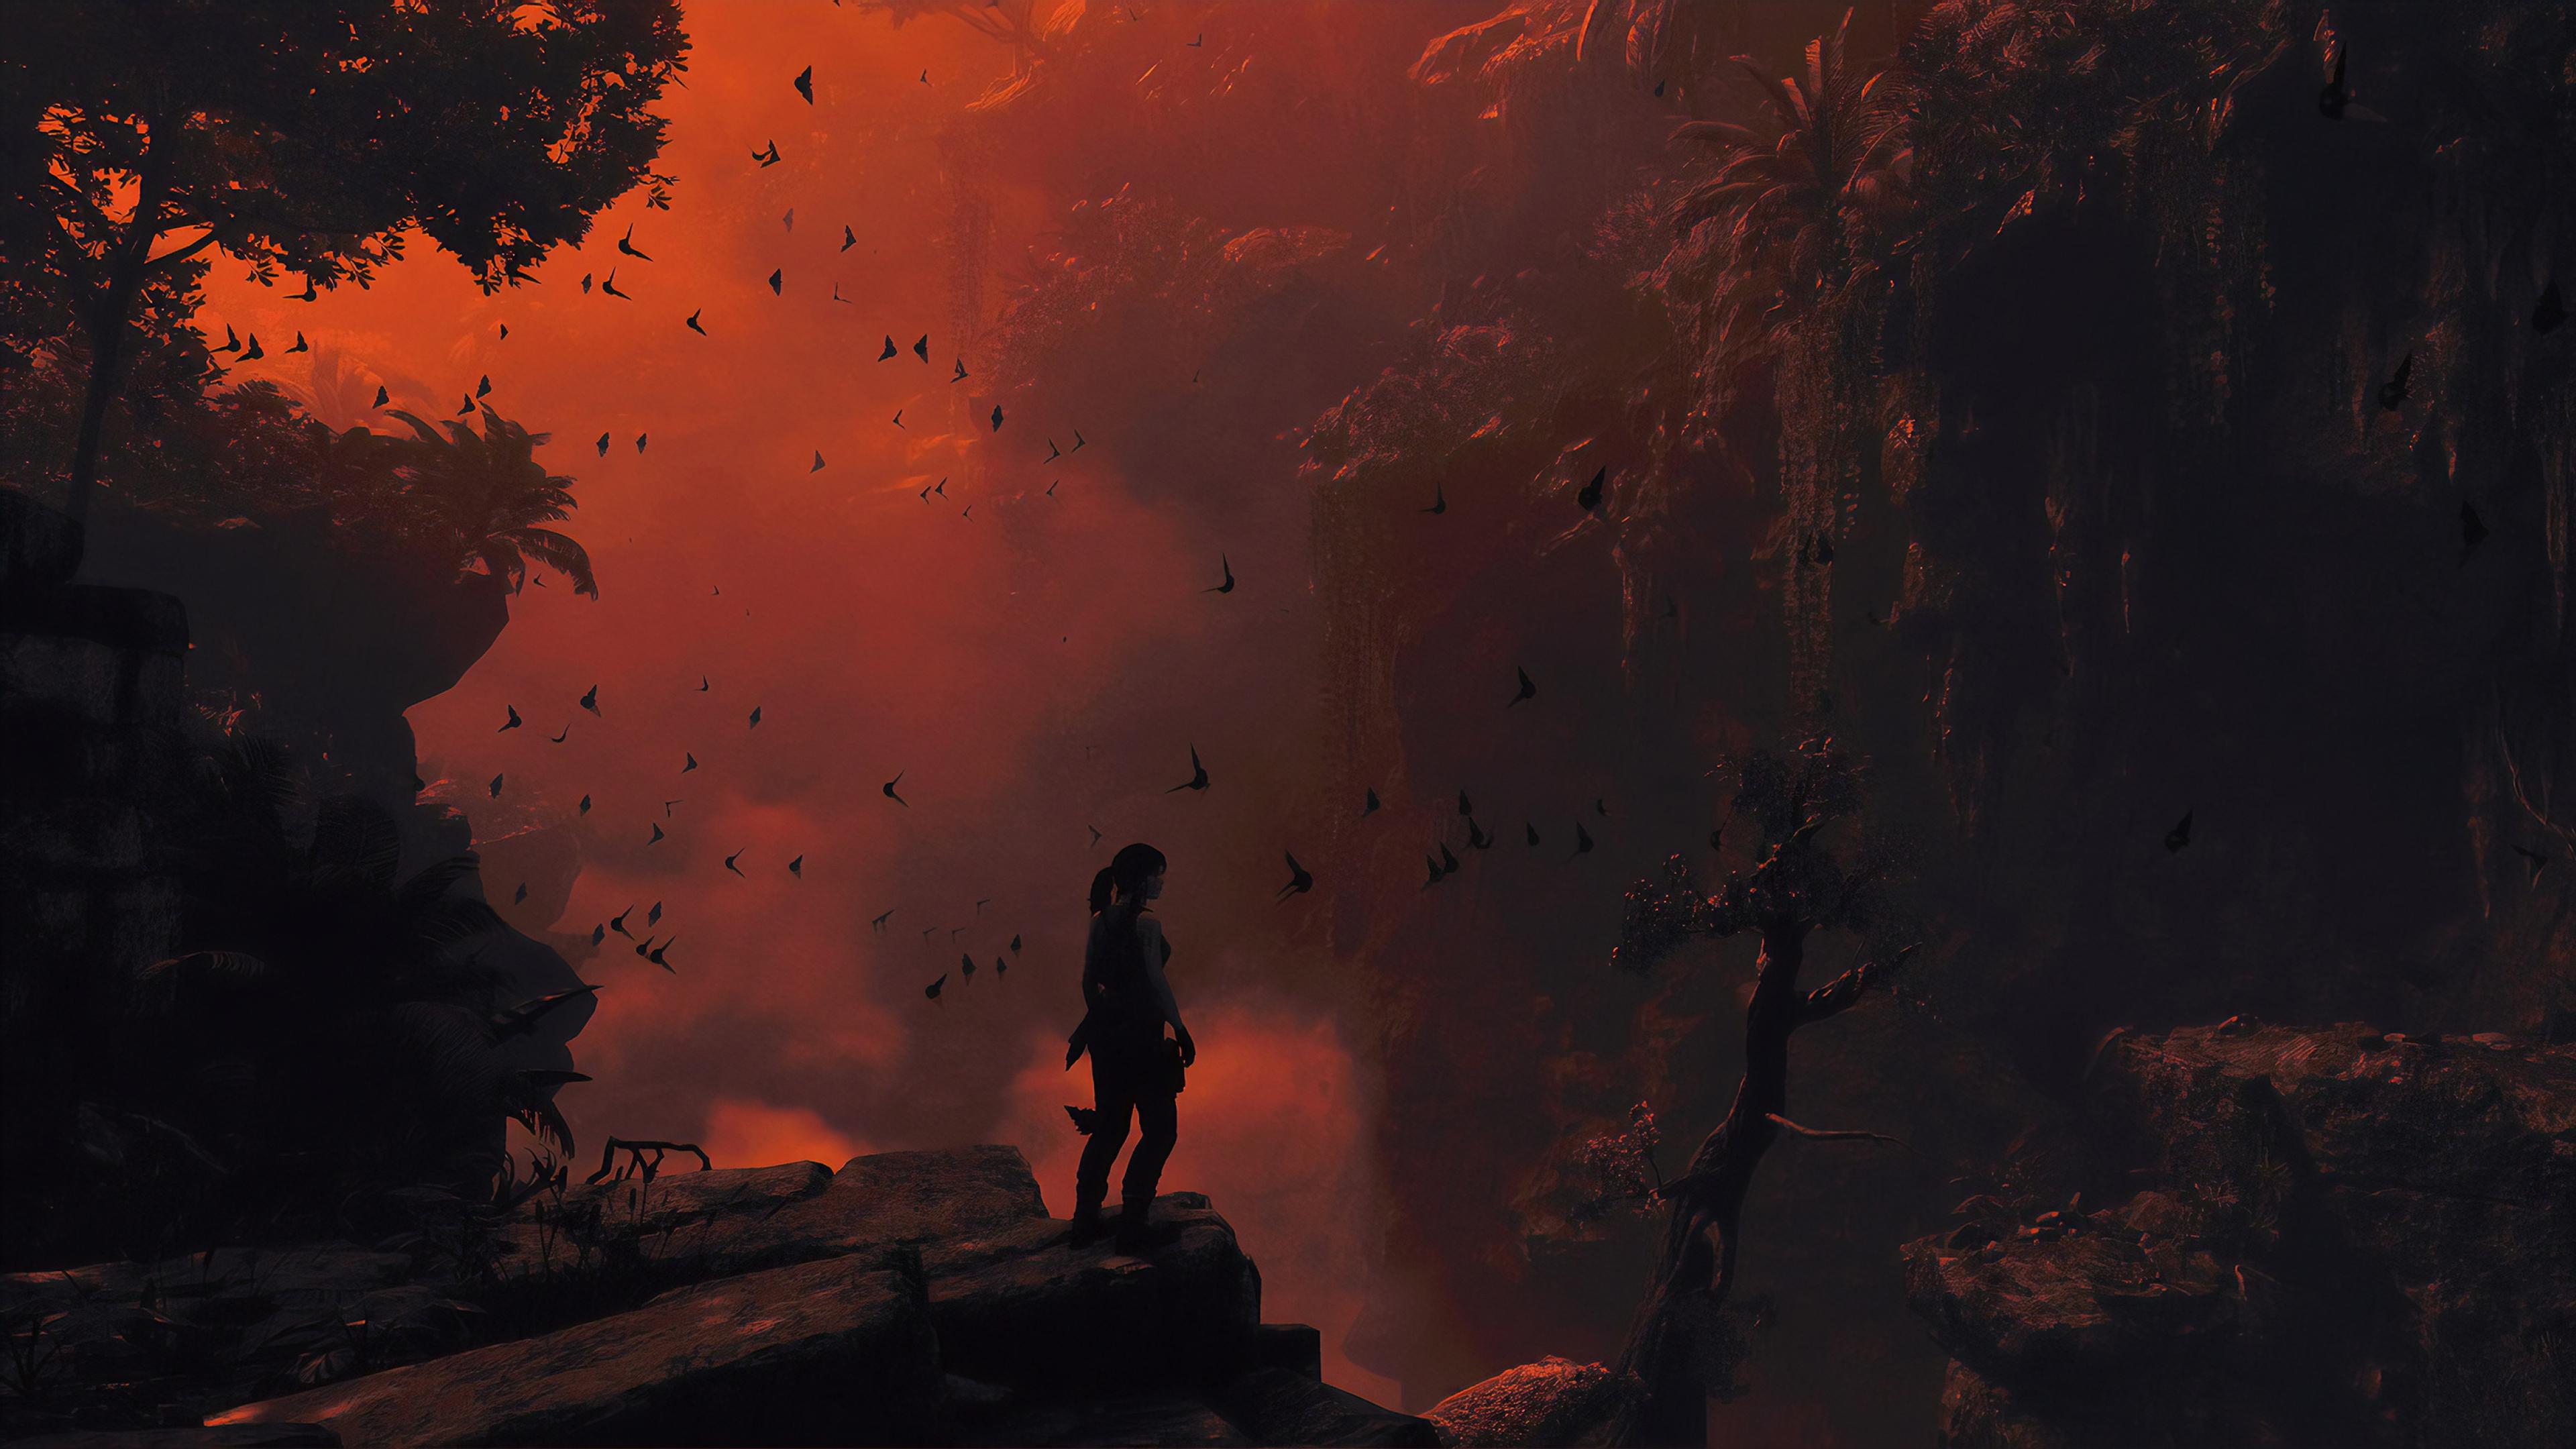 3840x2160 Apocalypse Shadow Of The Tomb Raider 4k Wallpaper Hd